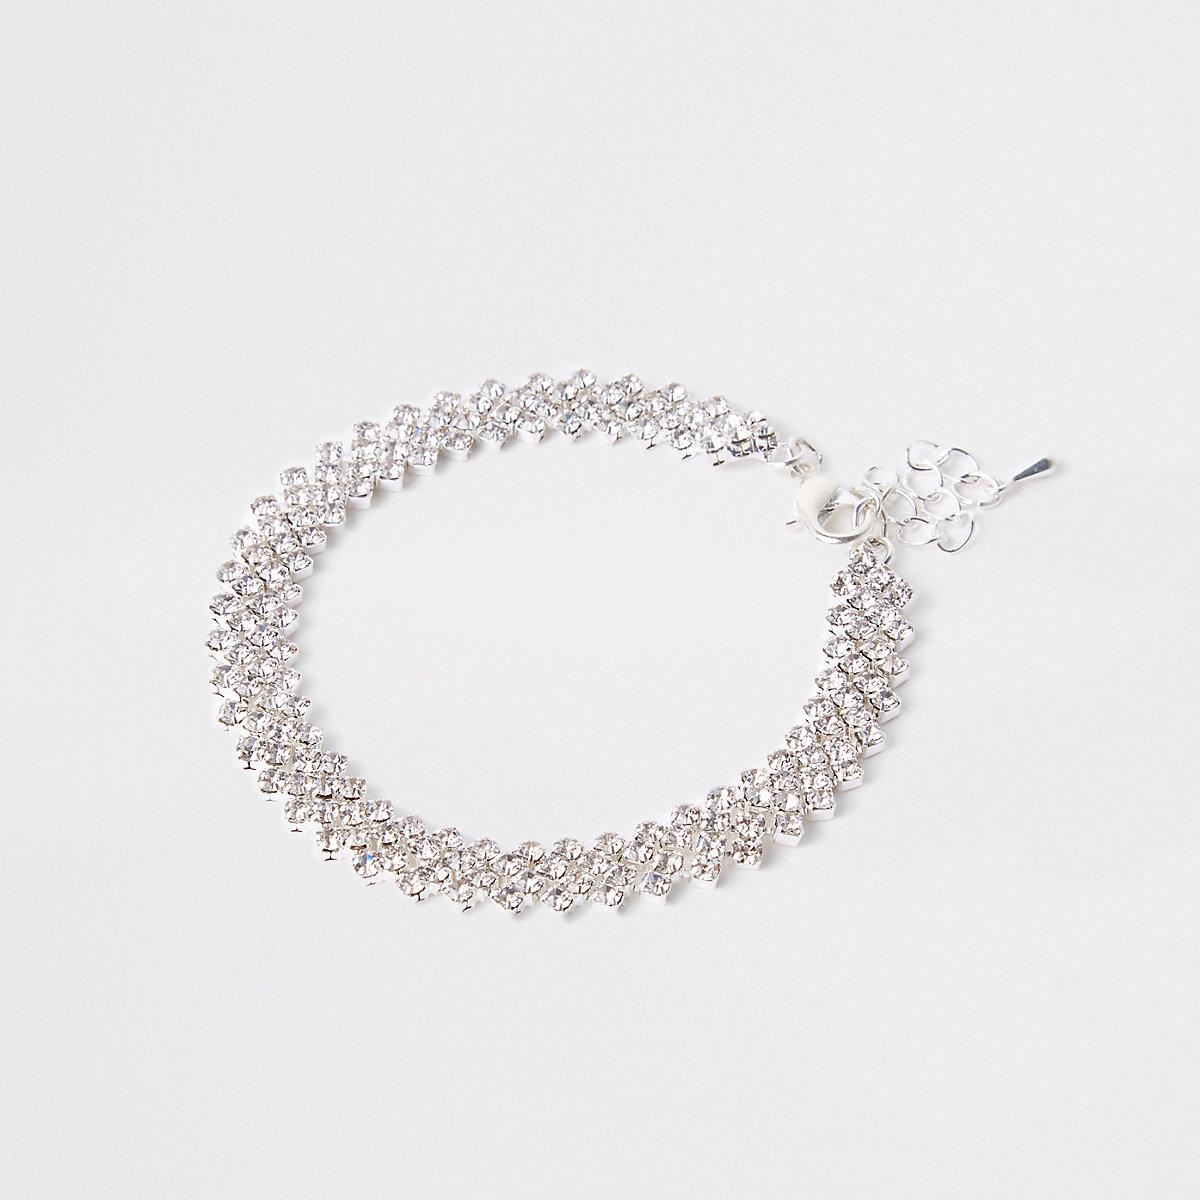 Silver tone layered rhinestone bracelet